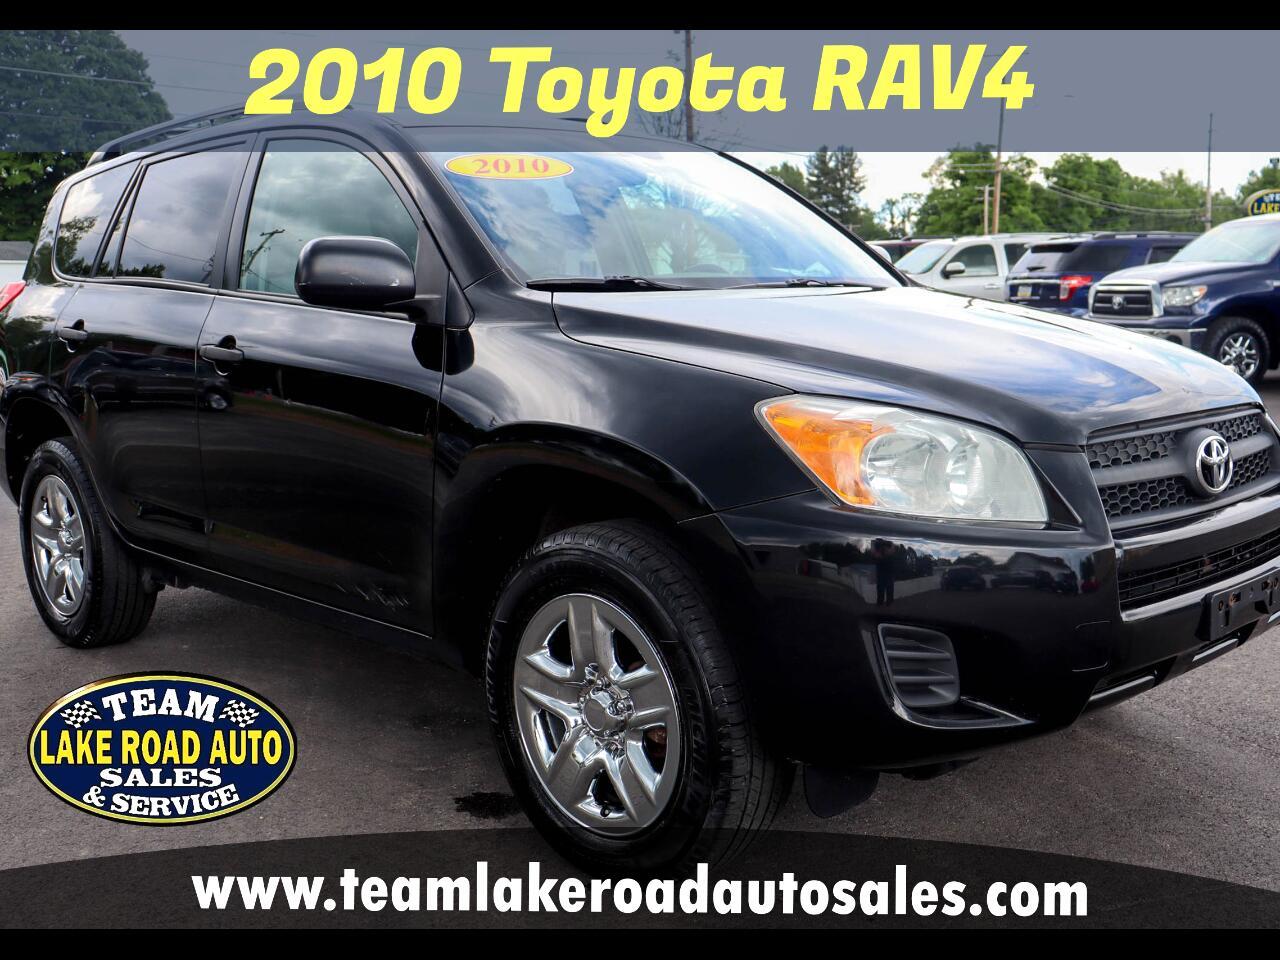 Toyota RAV4 4WD 4dr 4-cyl 4-Spd AT (Natl) 2010